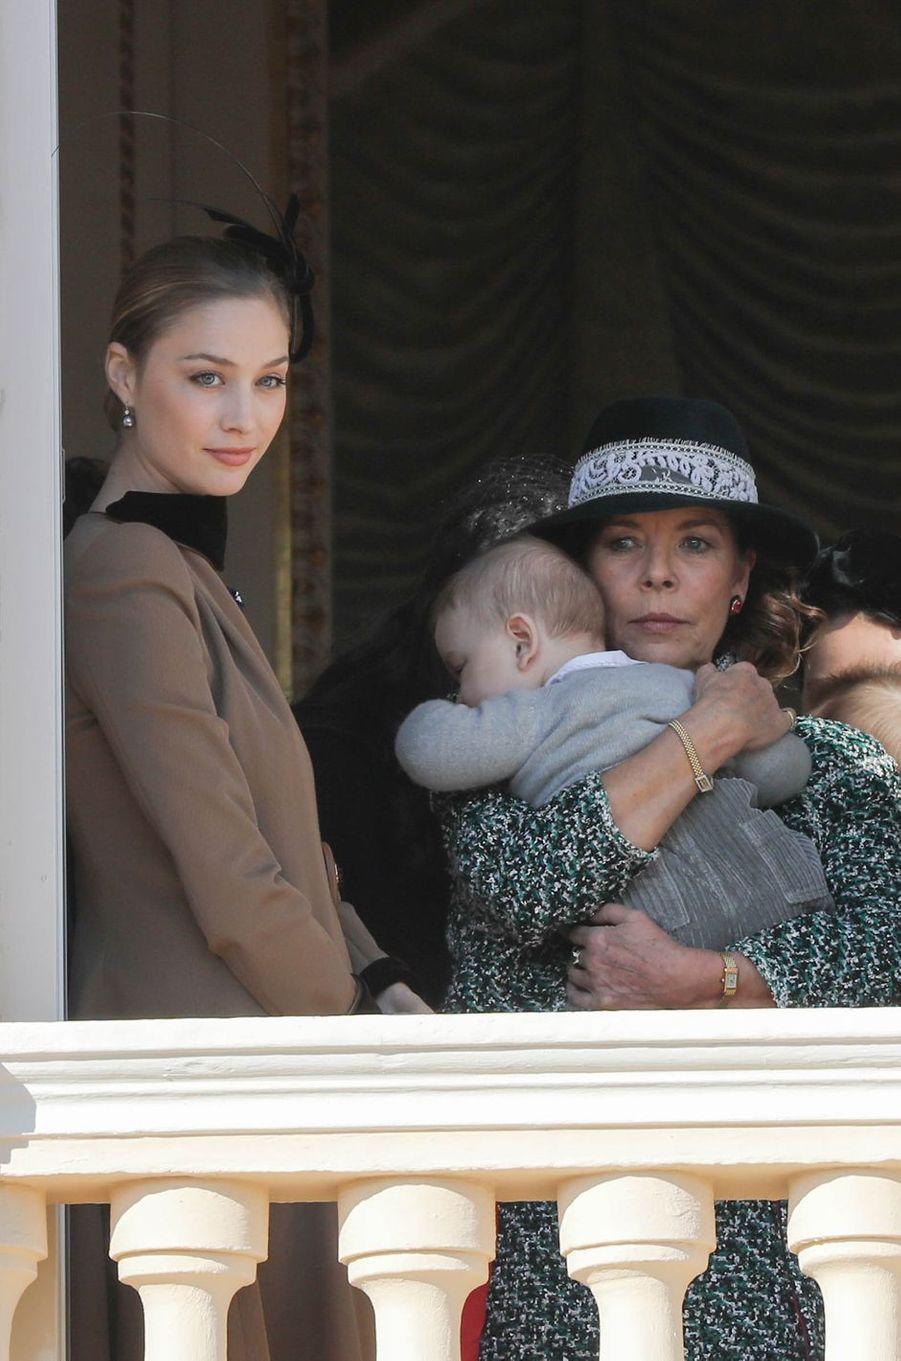 Beatrice Borromeo, la princesse Caroline de Hanovre et Francesco Casiraghi à Monaco, le 19 novembre 2018